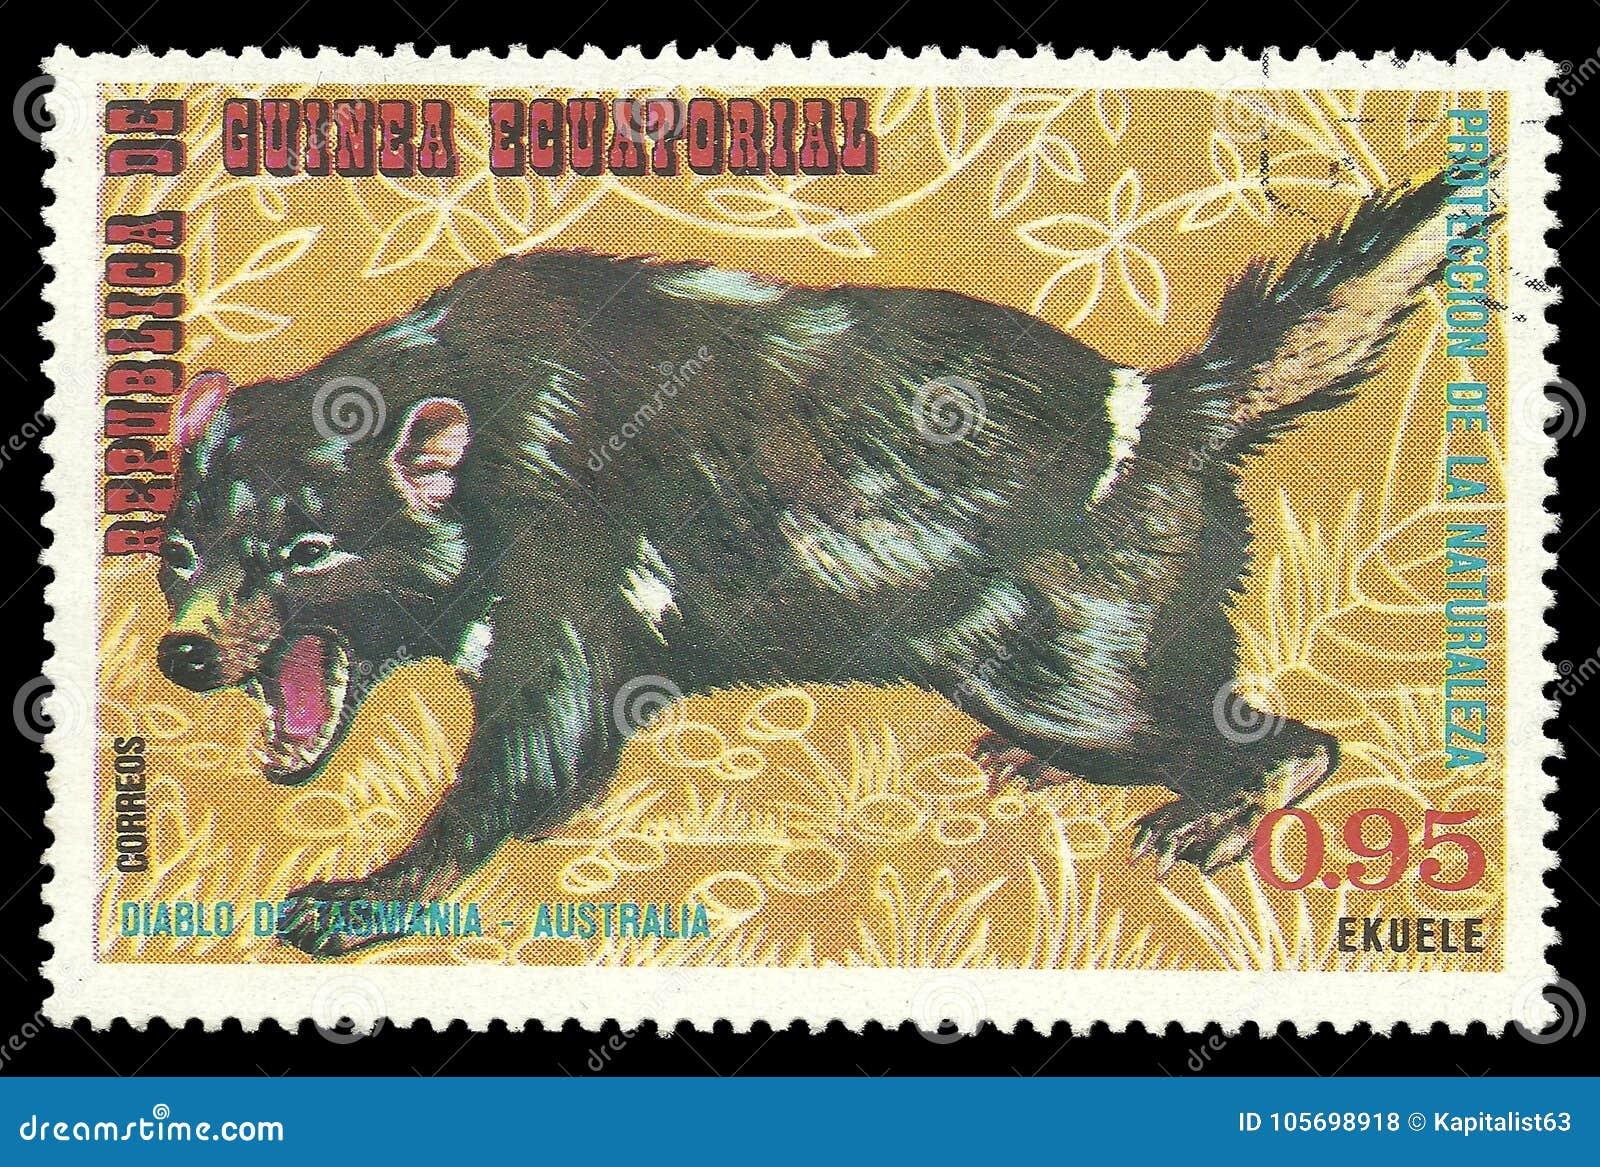 Animais australianos, diabo tasmaniano